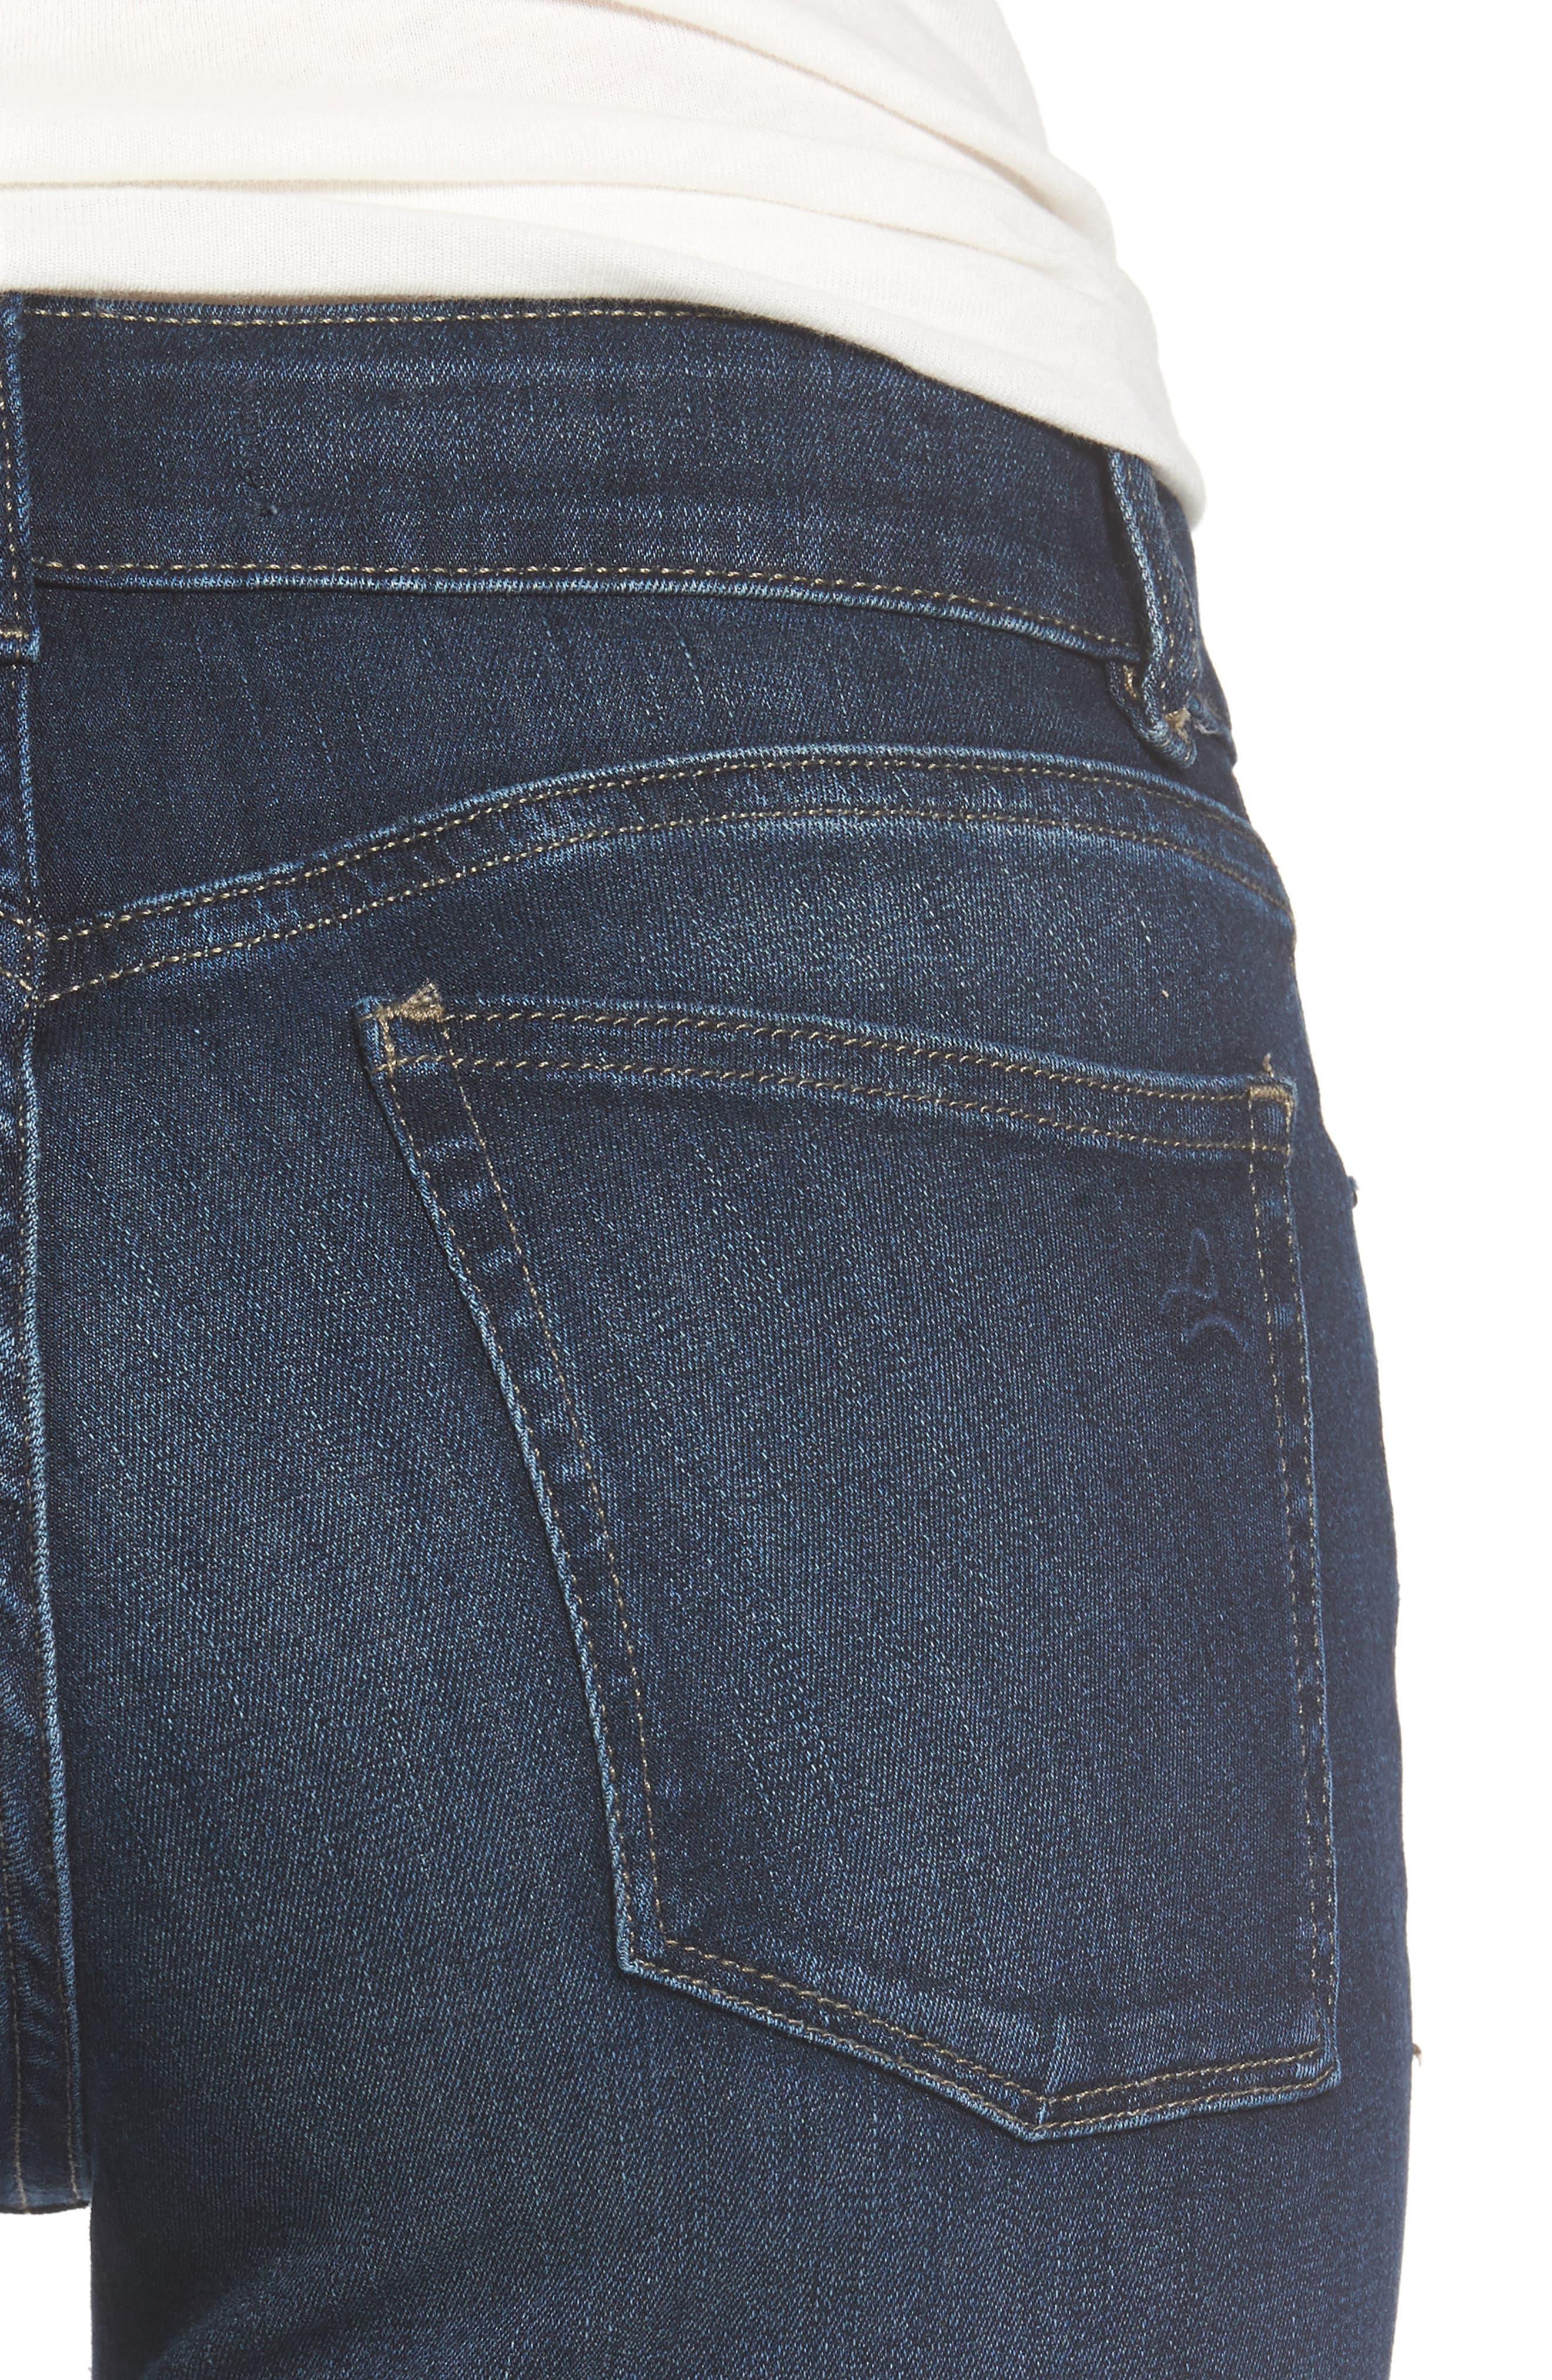 Margaux Instasculpt Ankle Skinny Jeans,                             Alternate thumbnail 4, color,                             Salt Creek